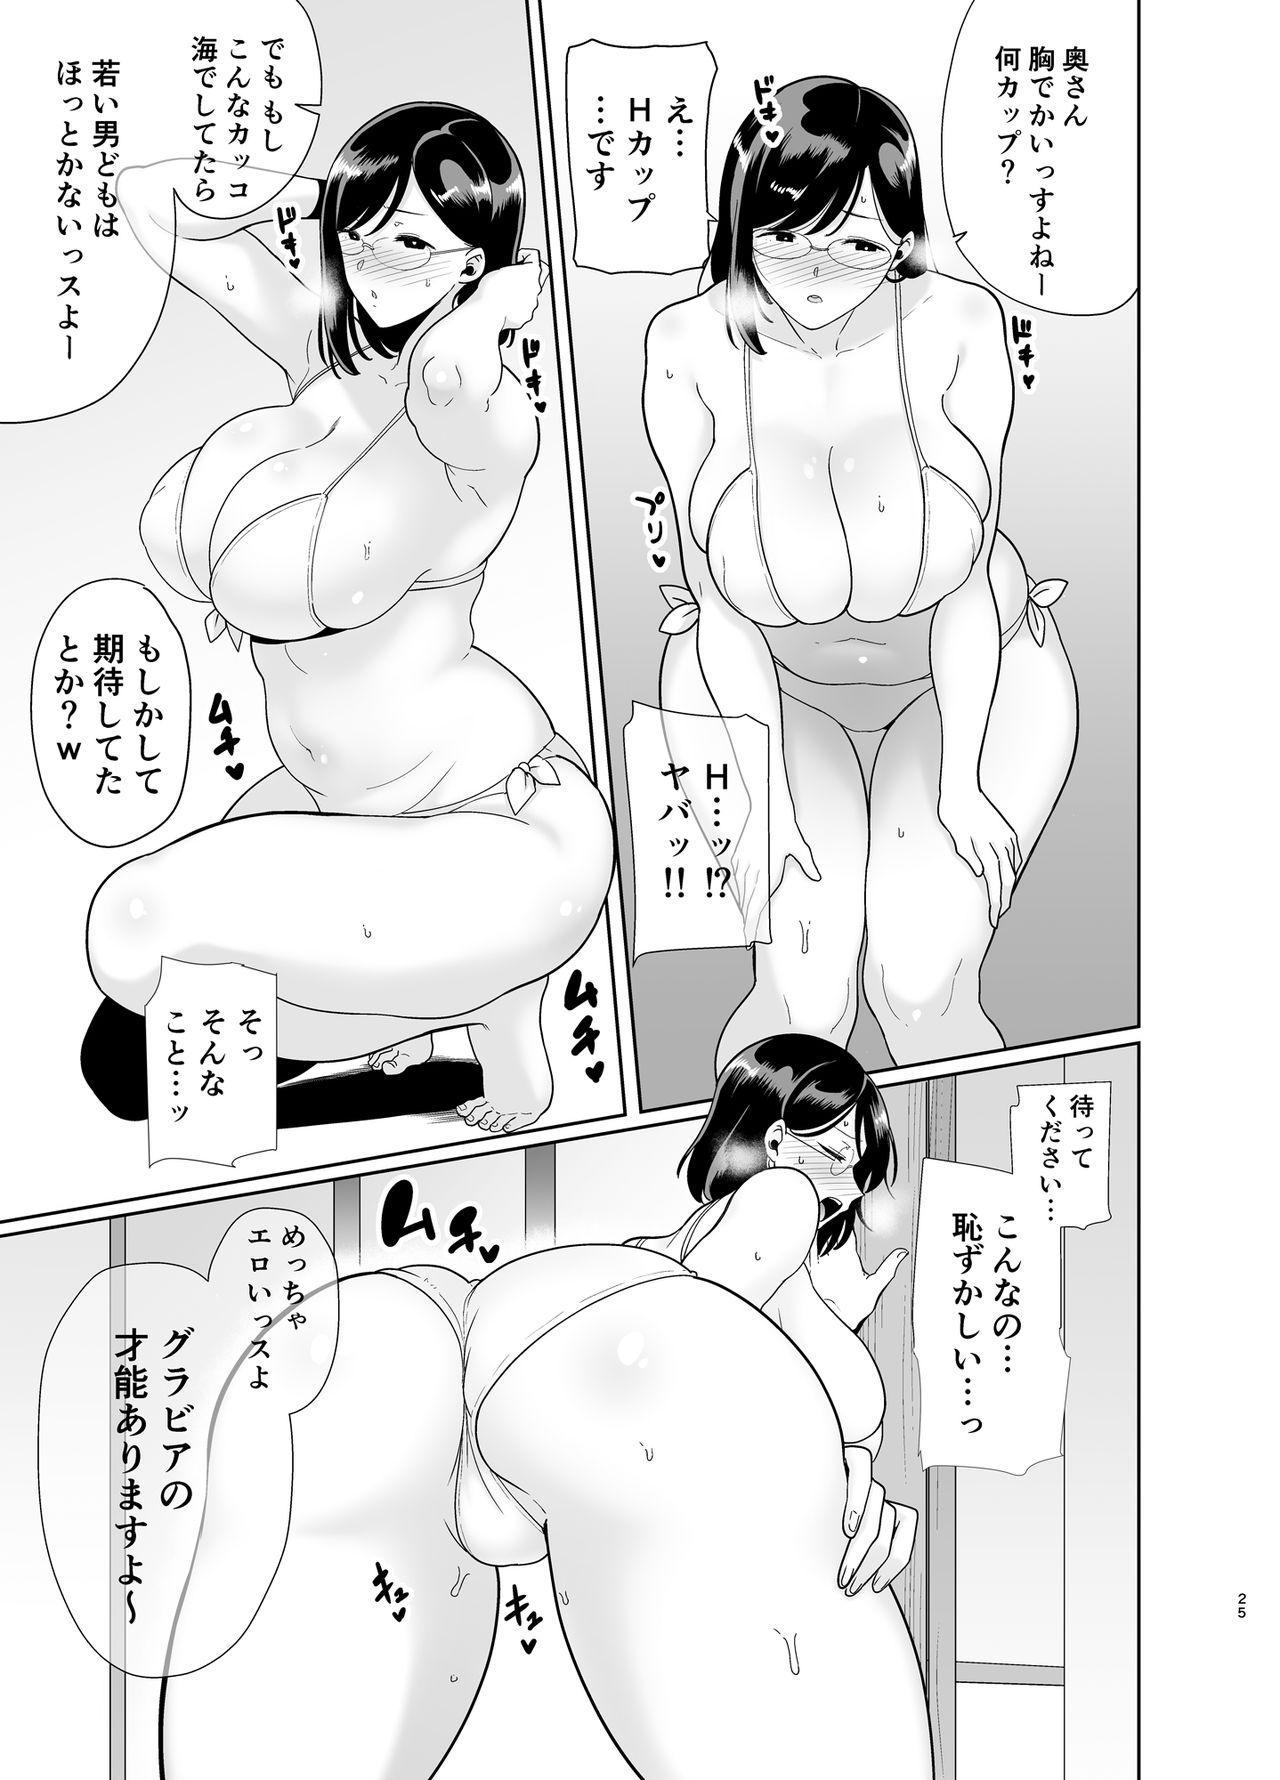 Natsuzuma 23